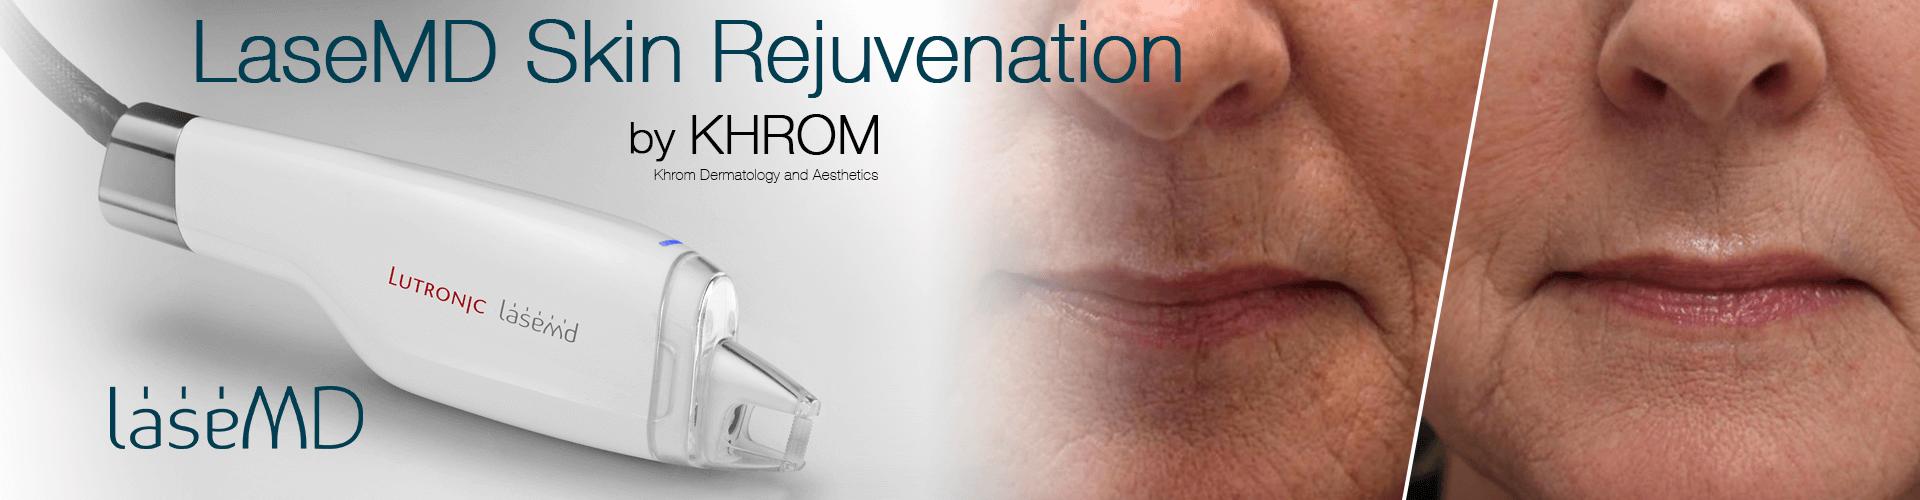 LaseMD Skin Rejuvenation By Khrom